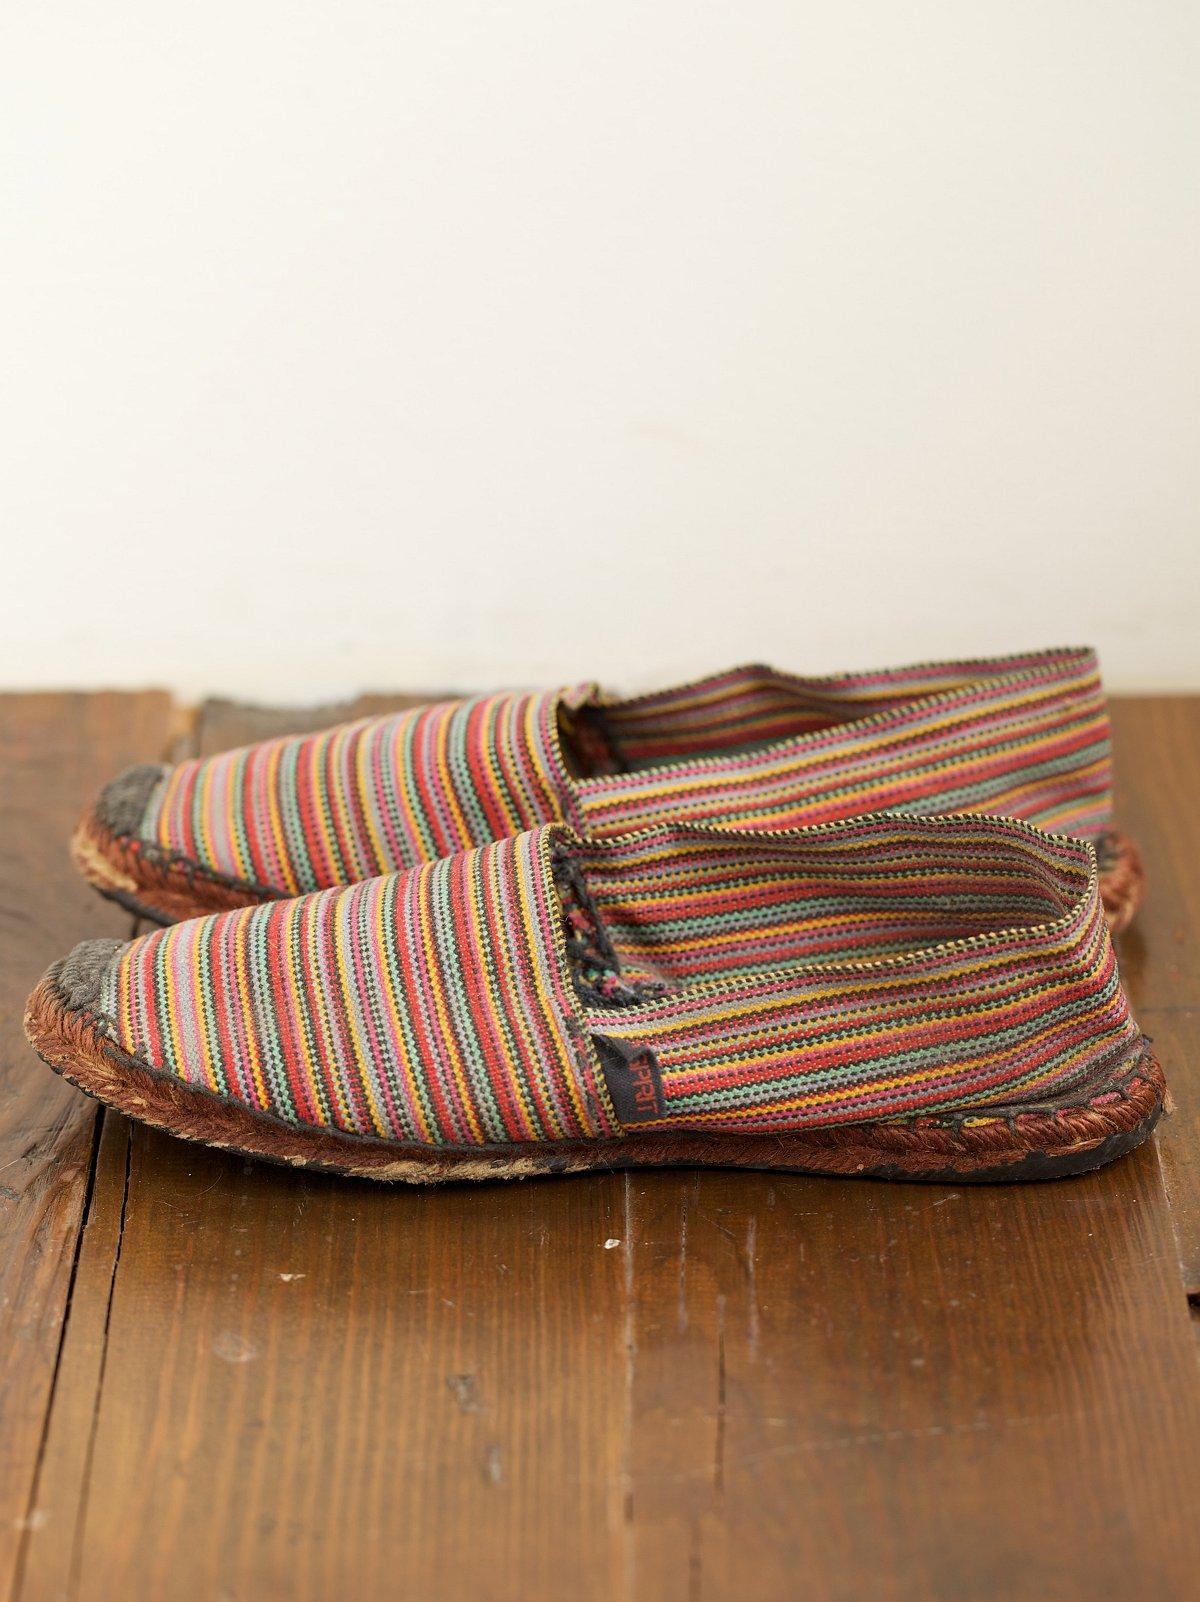 Vintage Multicolored Woven Espadrilles